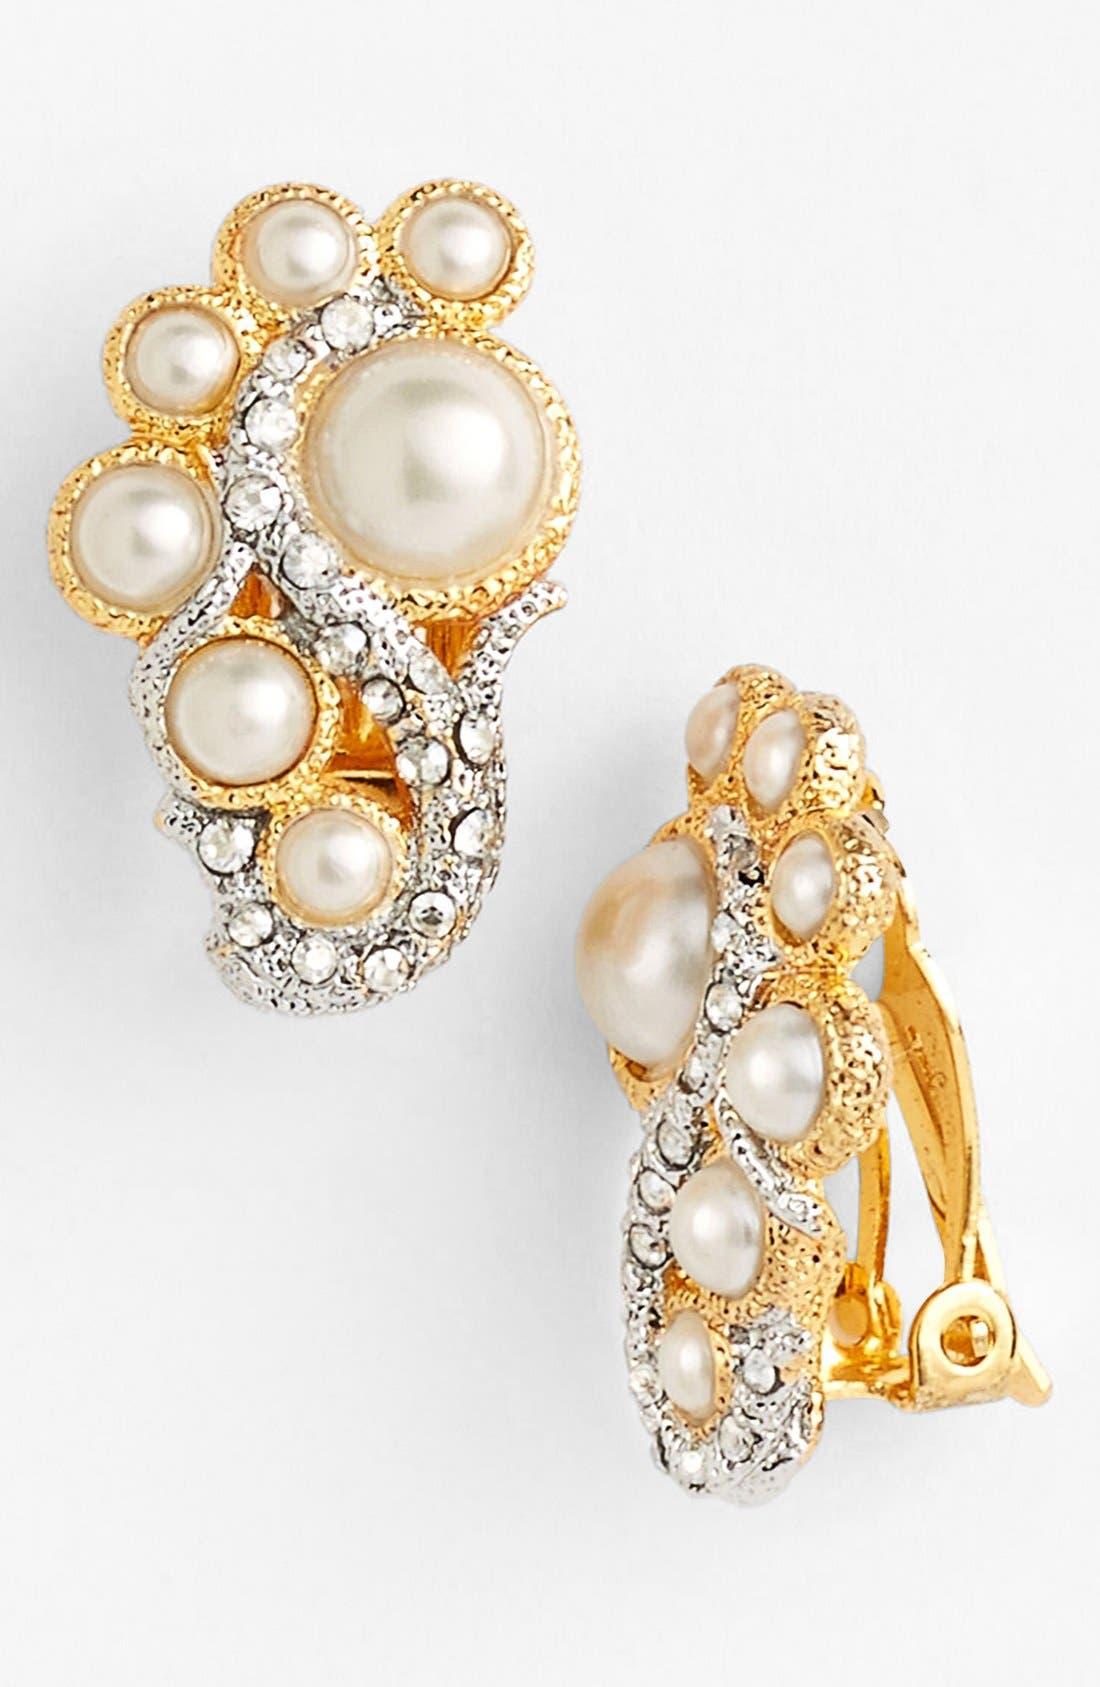 Main Image - Alexis Bittar 'Elements - Maldivian' Clip Earrings